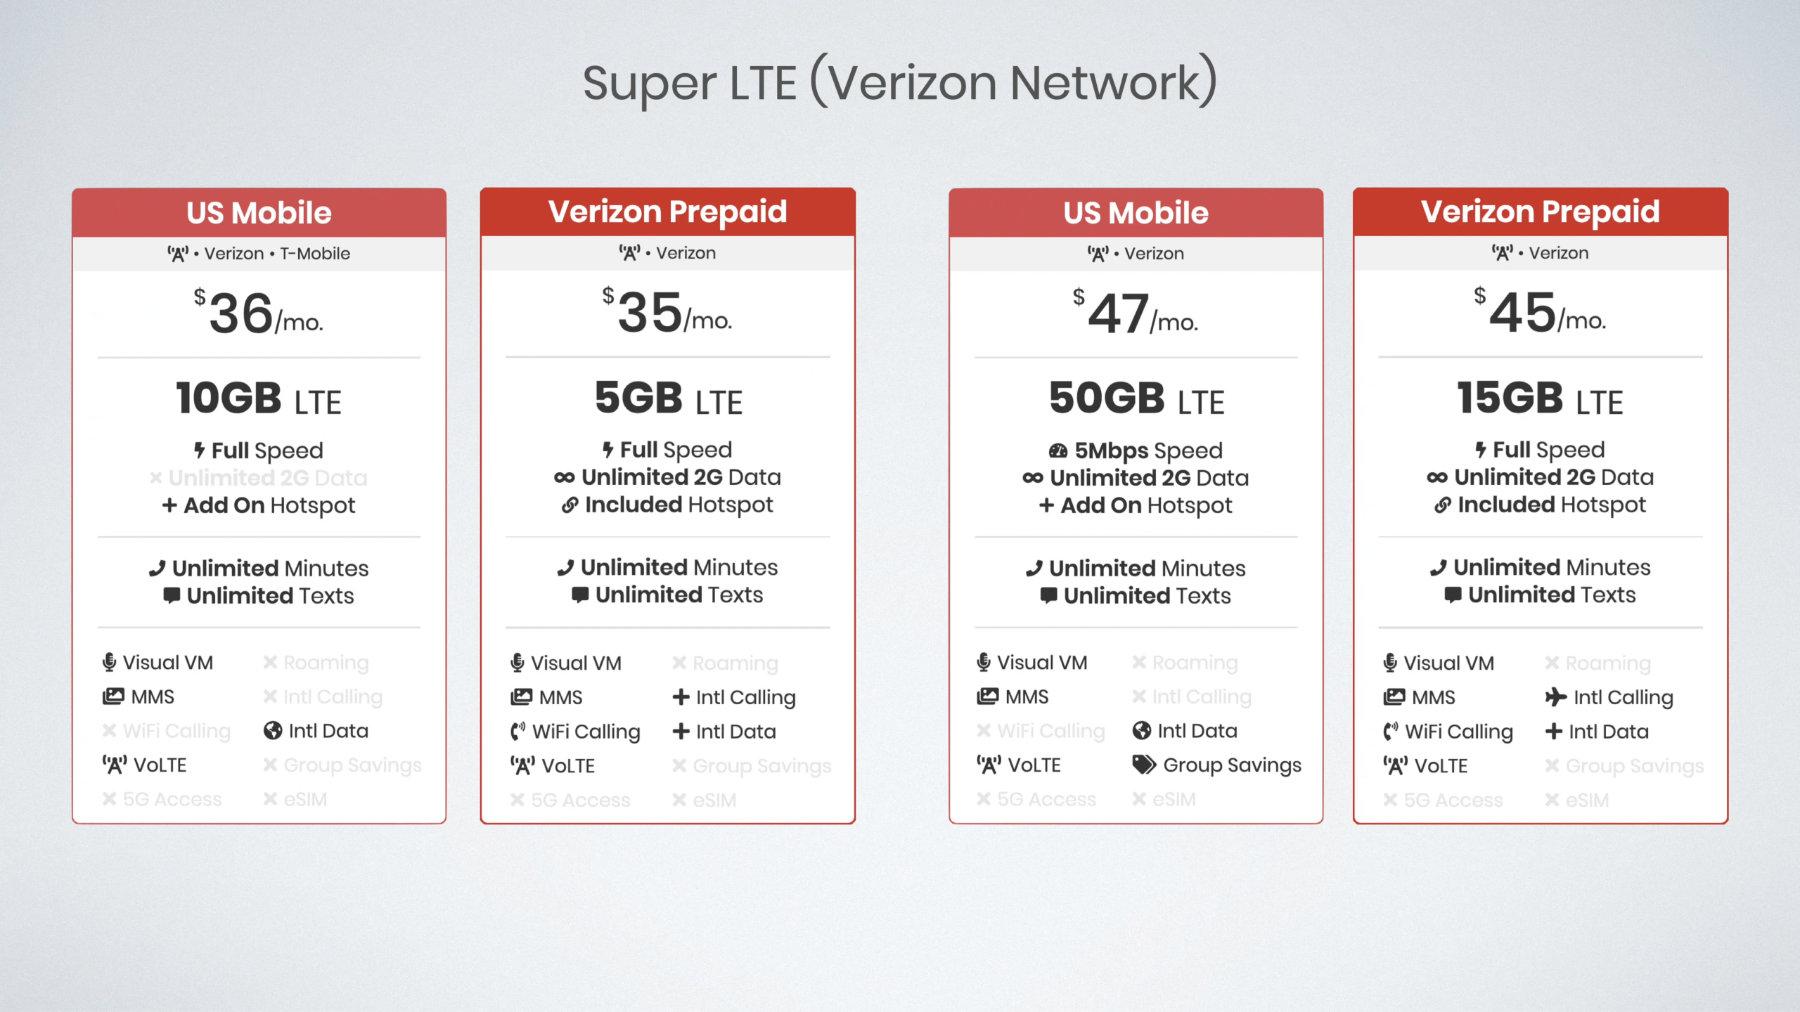 US Mobile versus Verizon Prepaid cell phone plan comparison